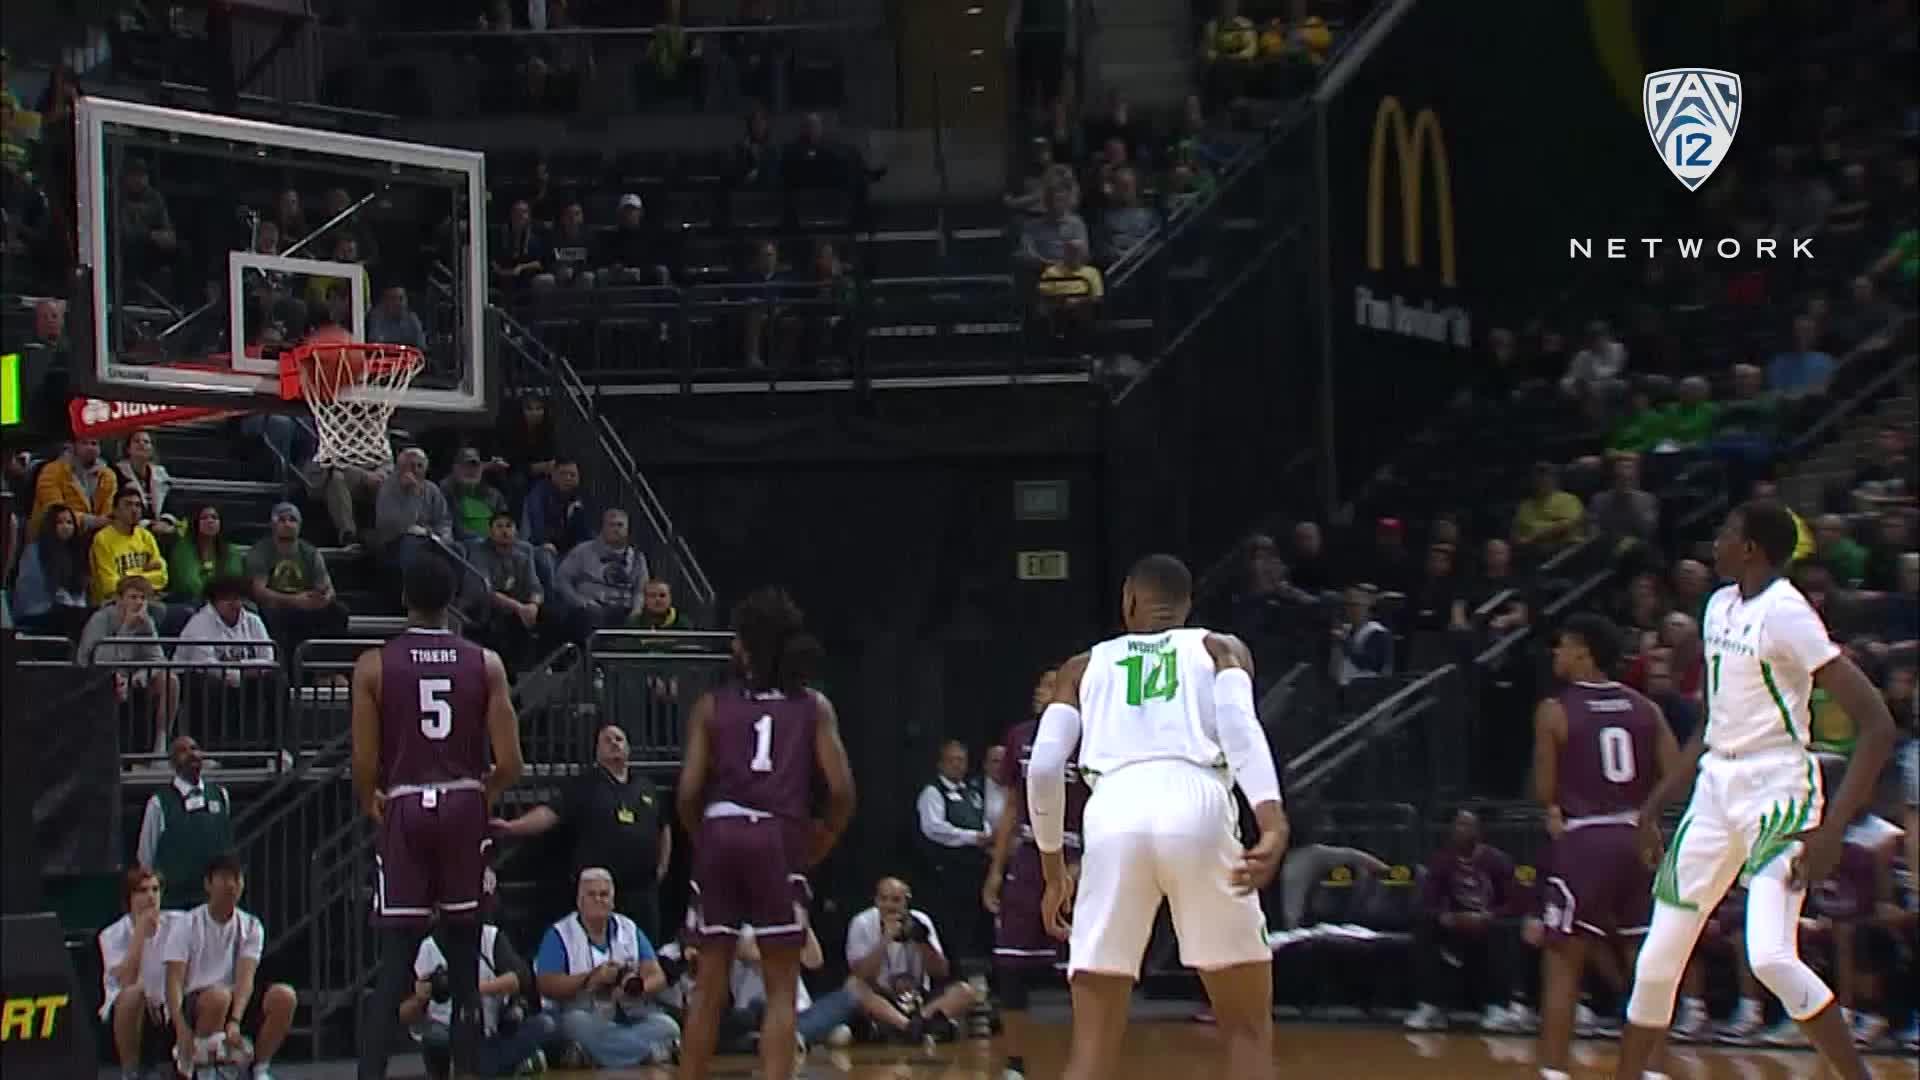 Oregon's Bol Bol brings 'length and skill' to NBA Draft according to basketball analyst Don MacLean